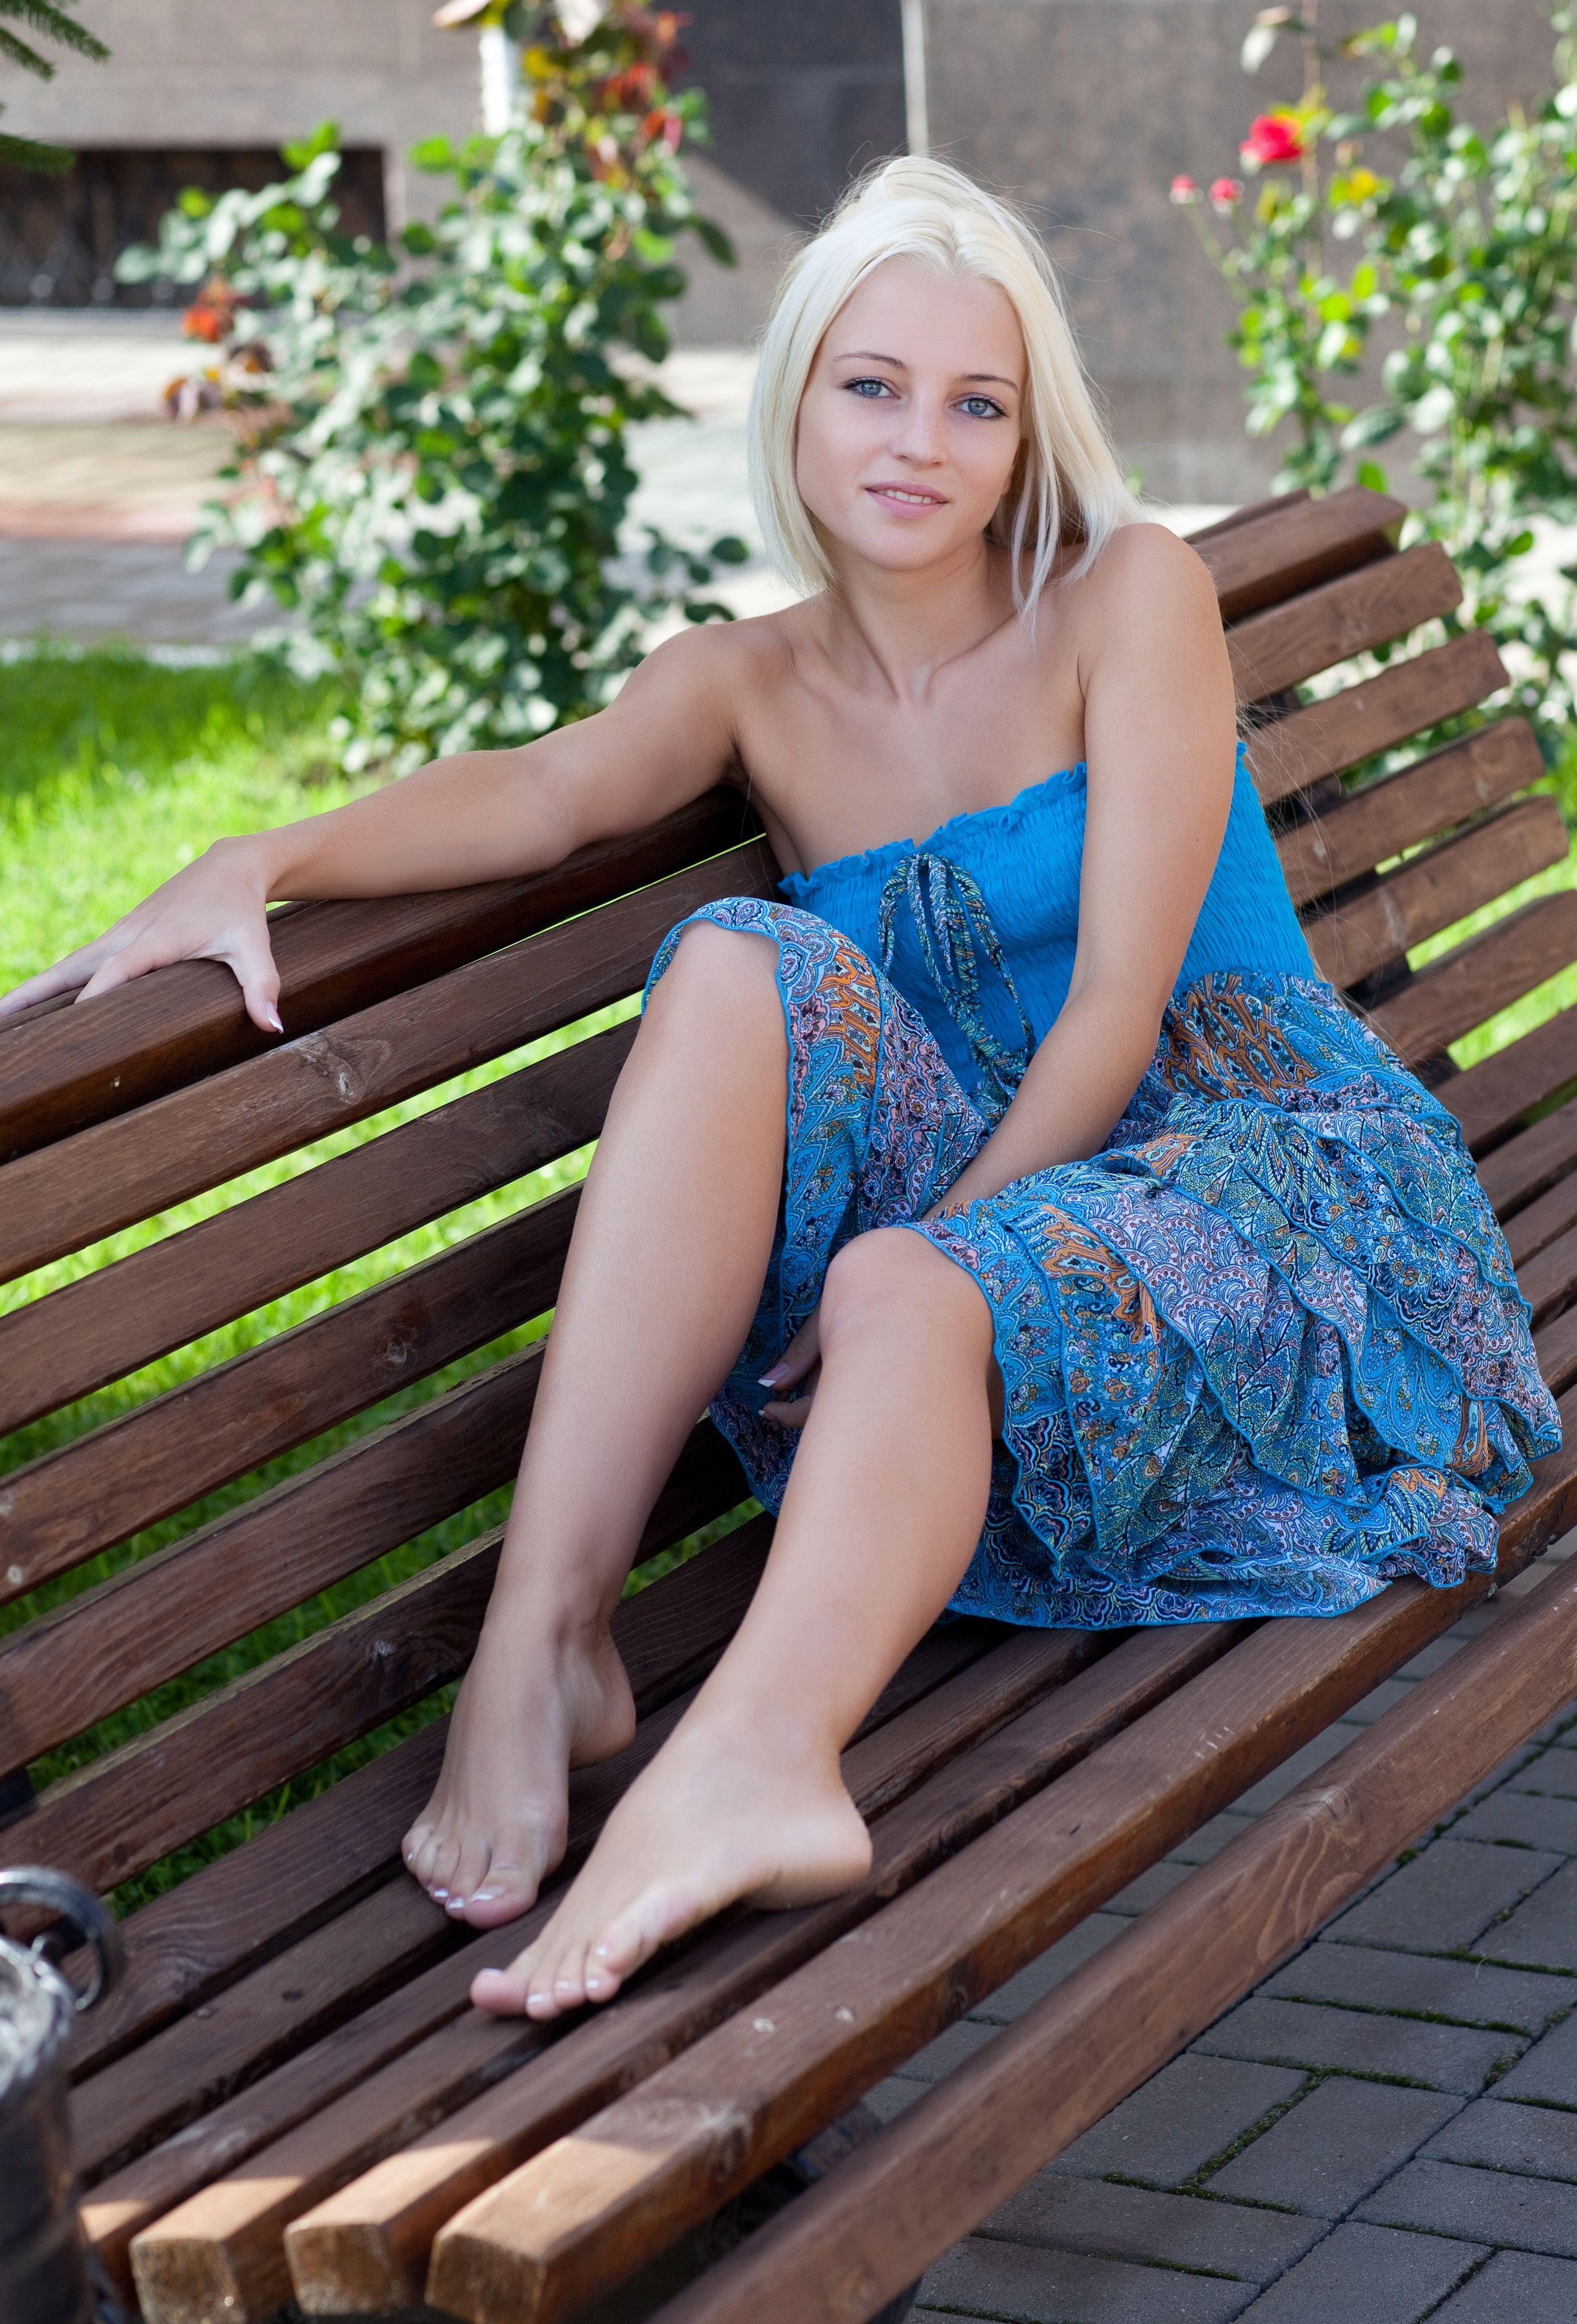 Maramodel Outlook Com Beautiful Women 3 Pinterest